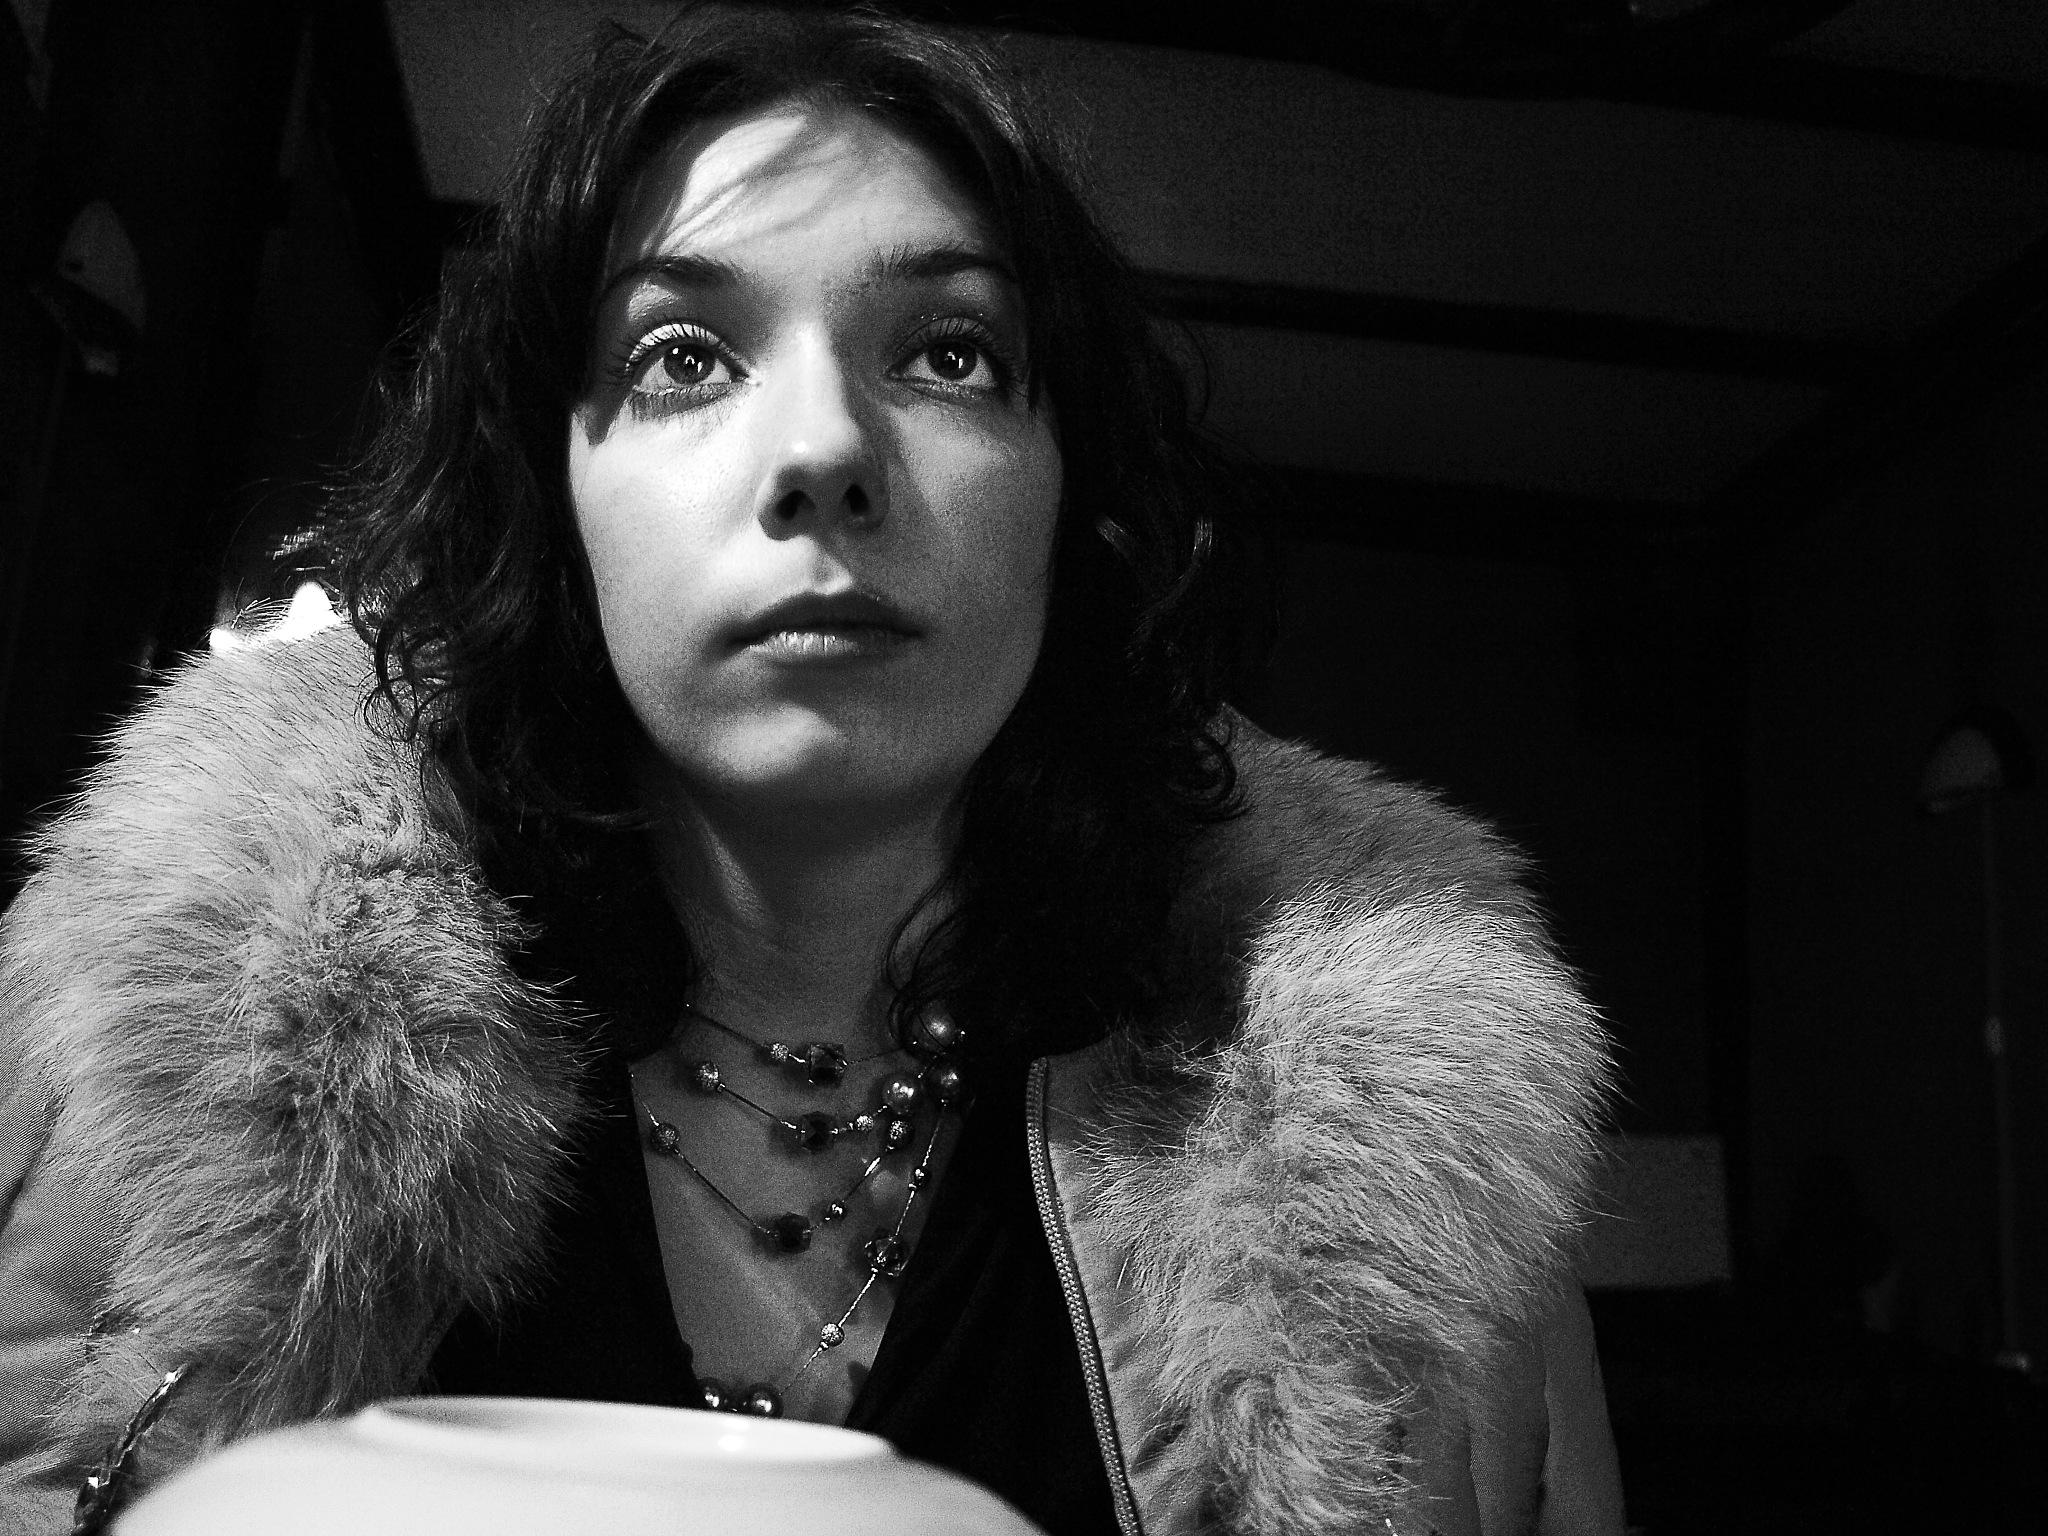 Olga in the cafe by Сергей Юрьев